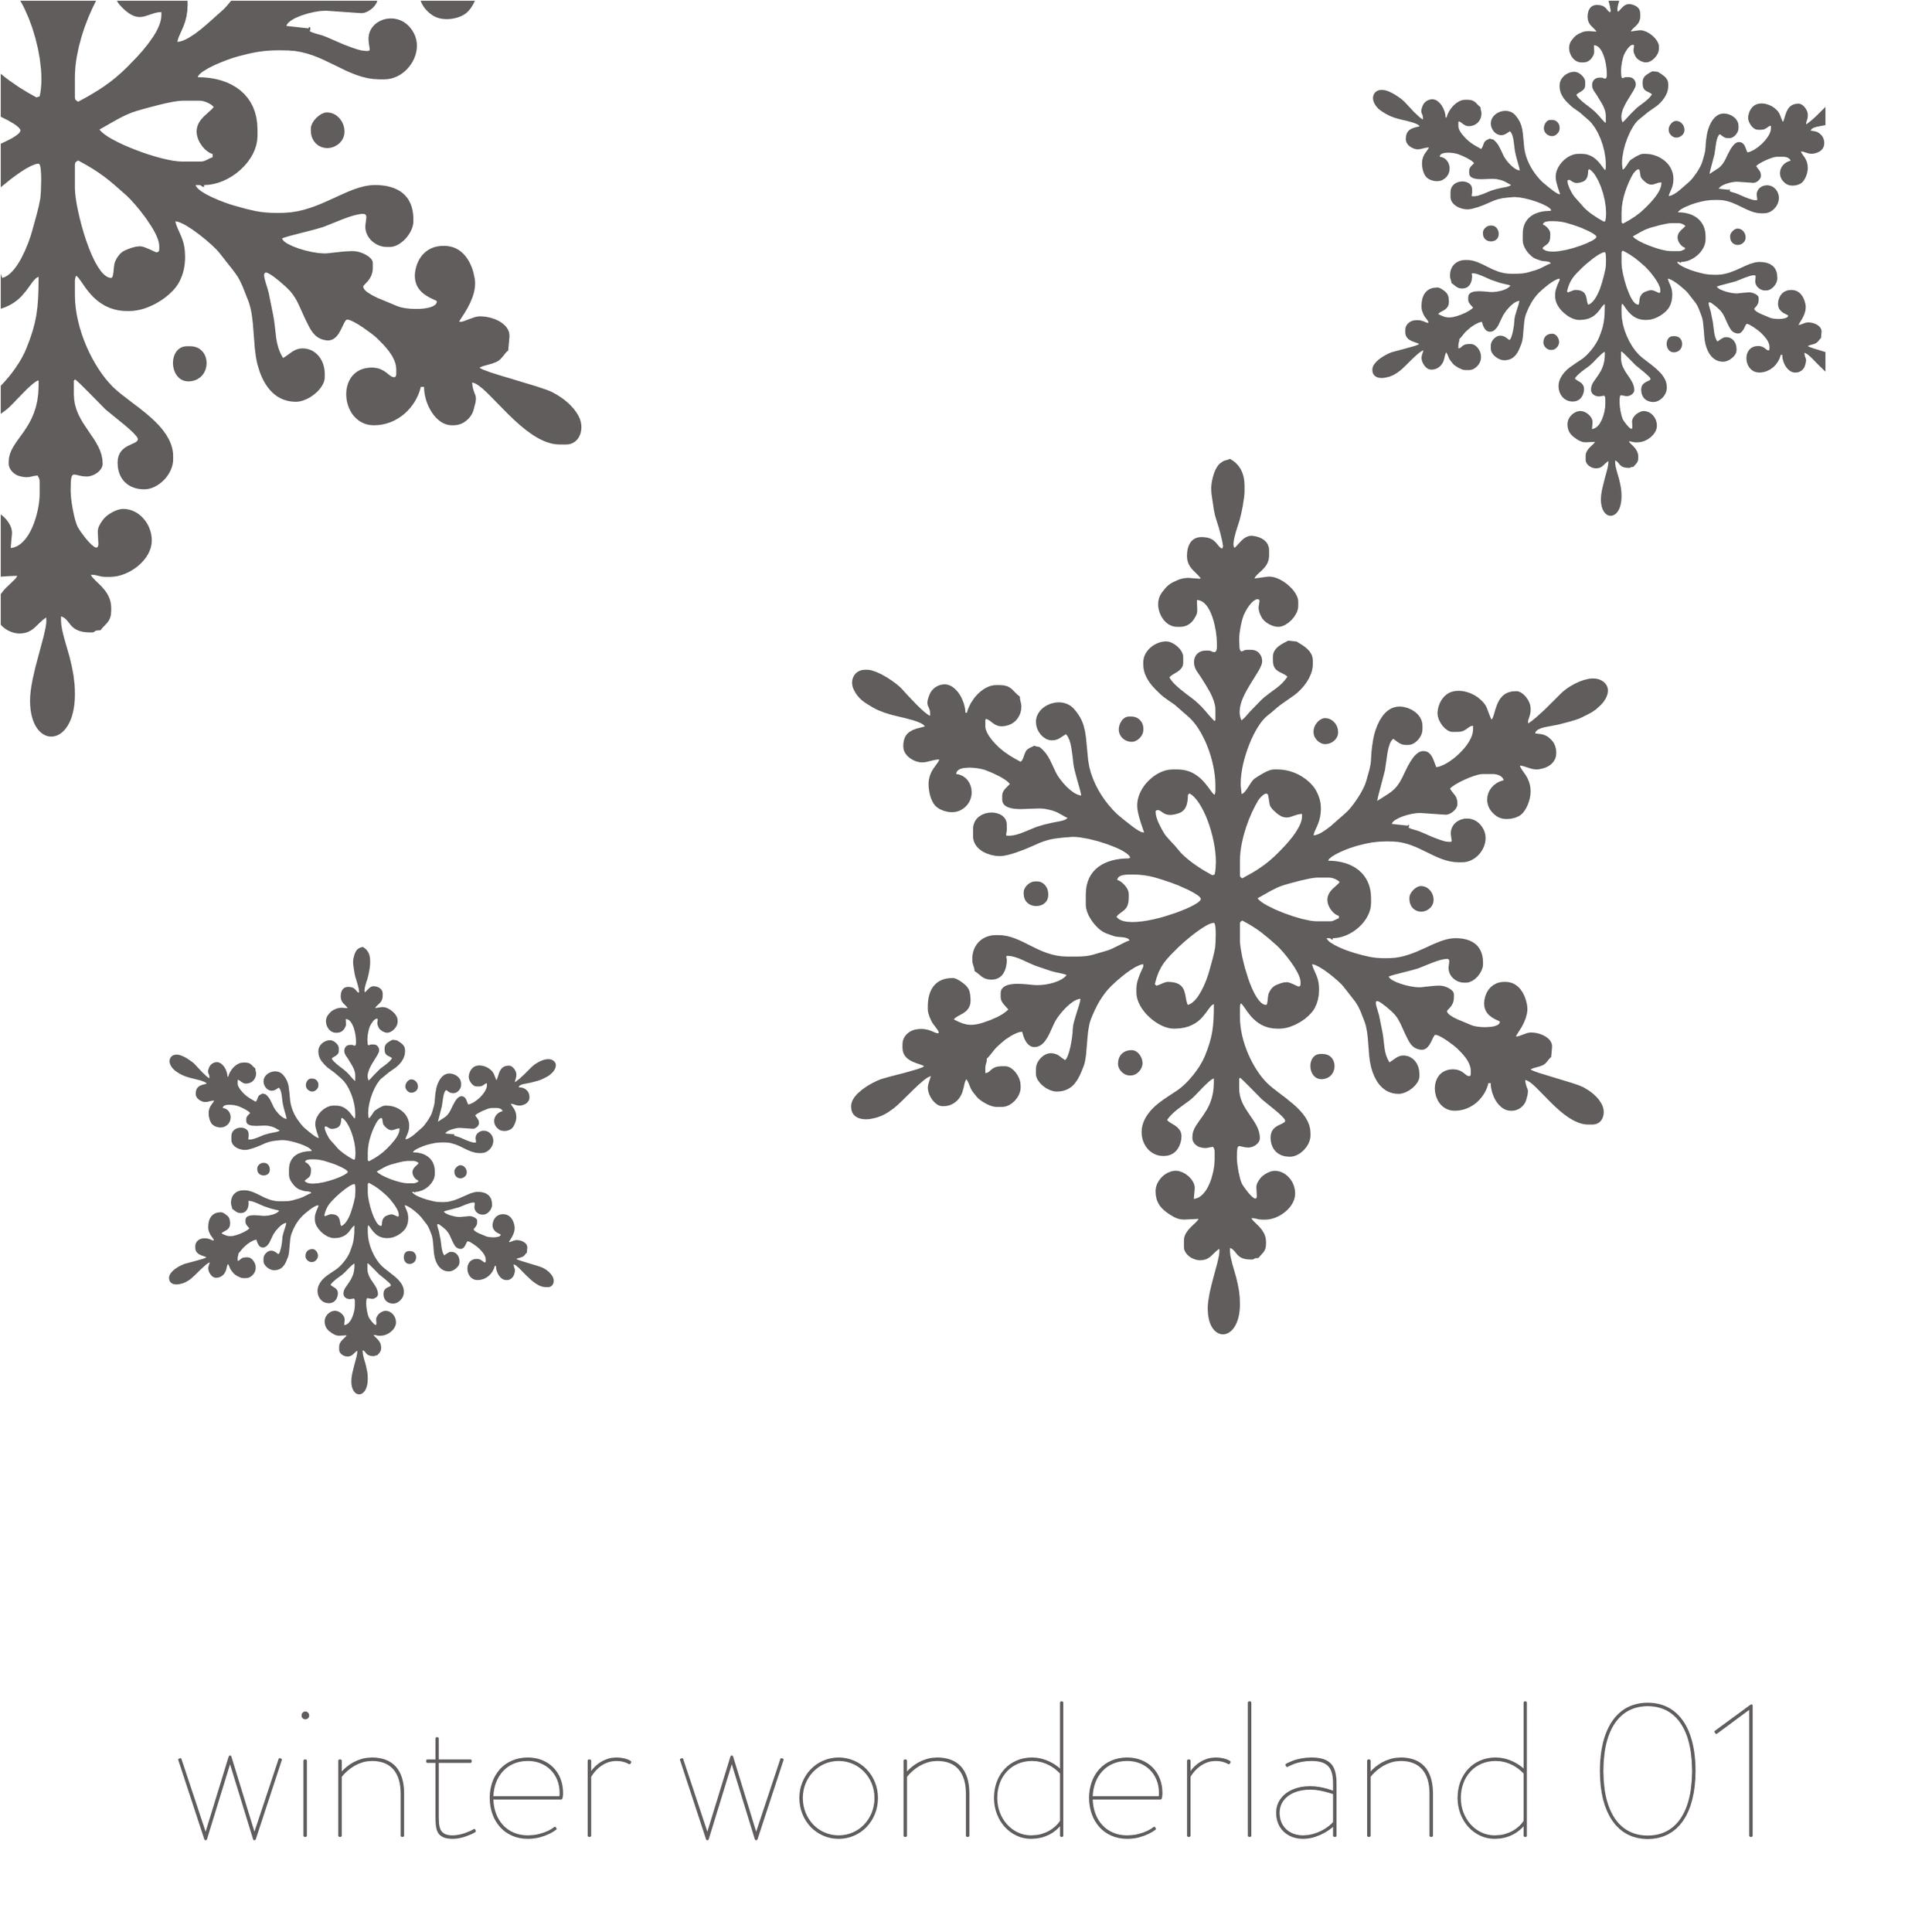 winter wonderland 01.png